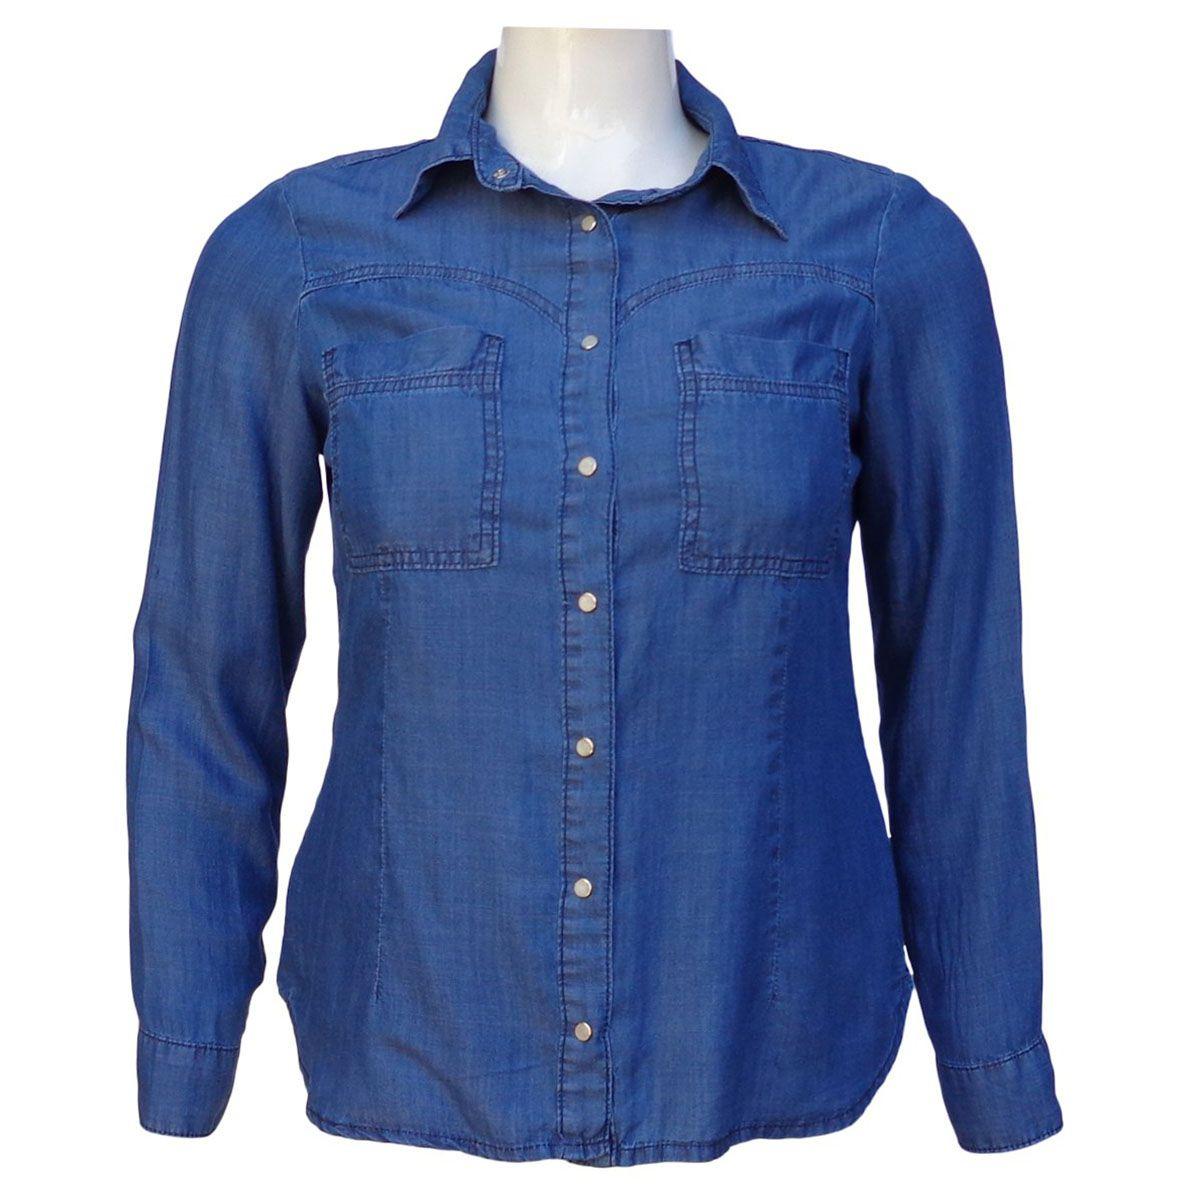 Camisa Jeans Liocel Feminina Manga Longa Plus Size